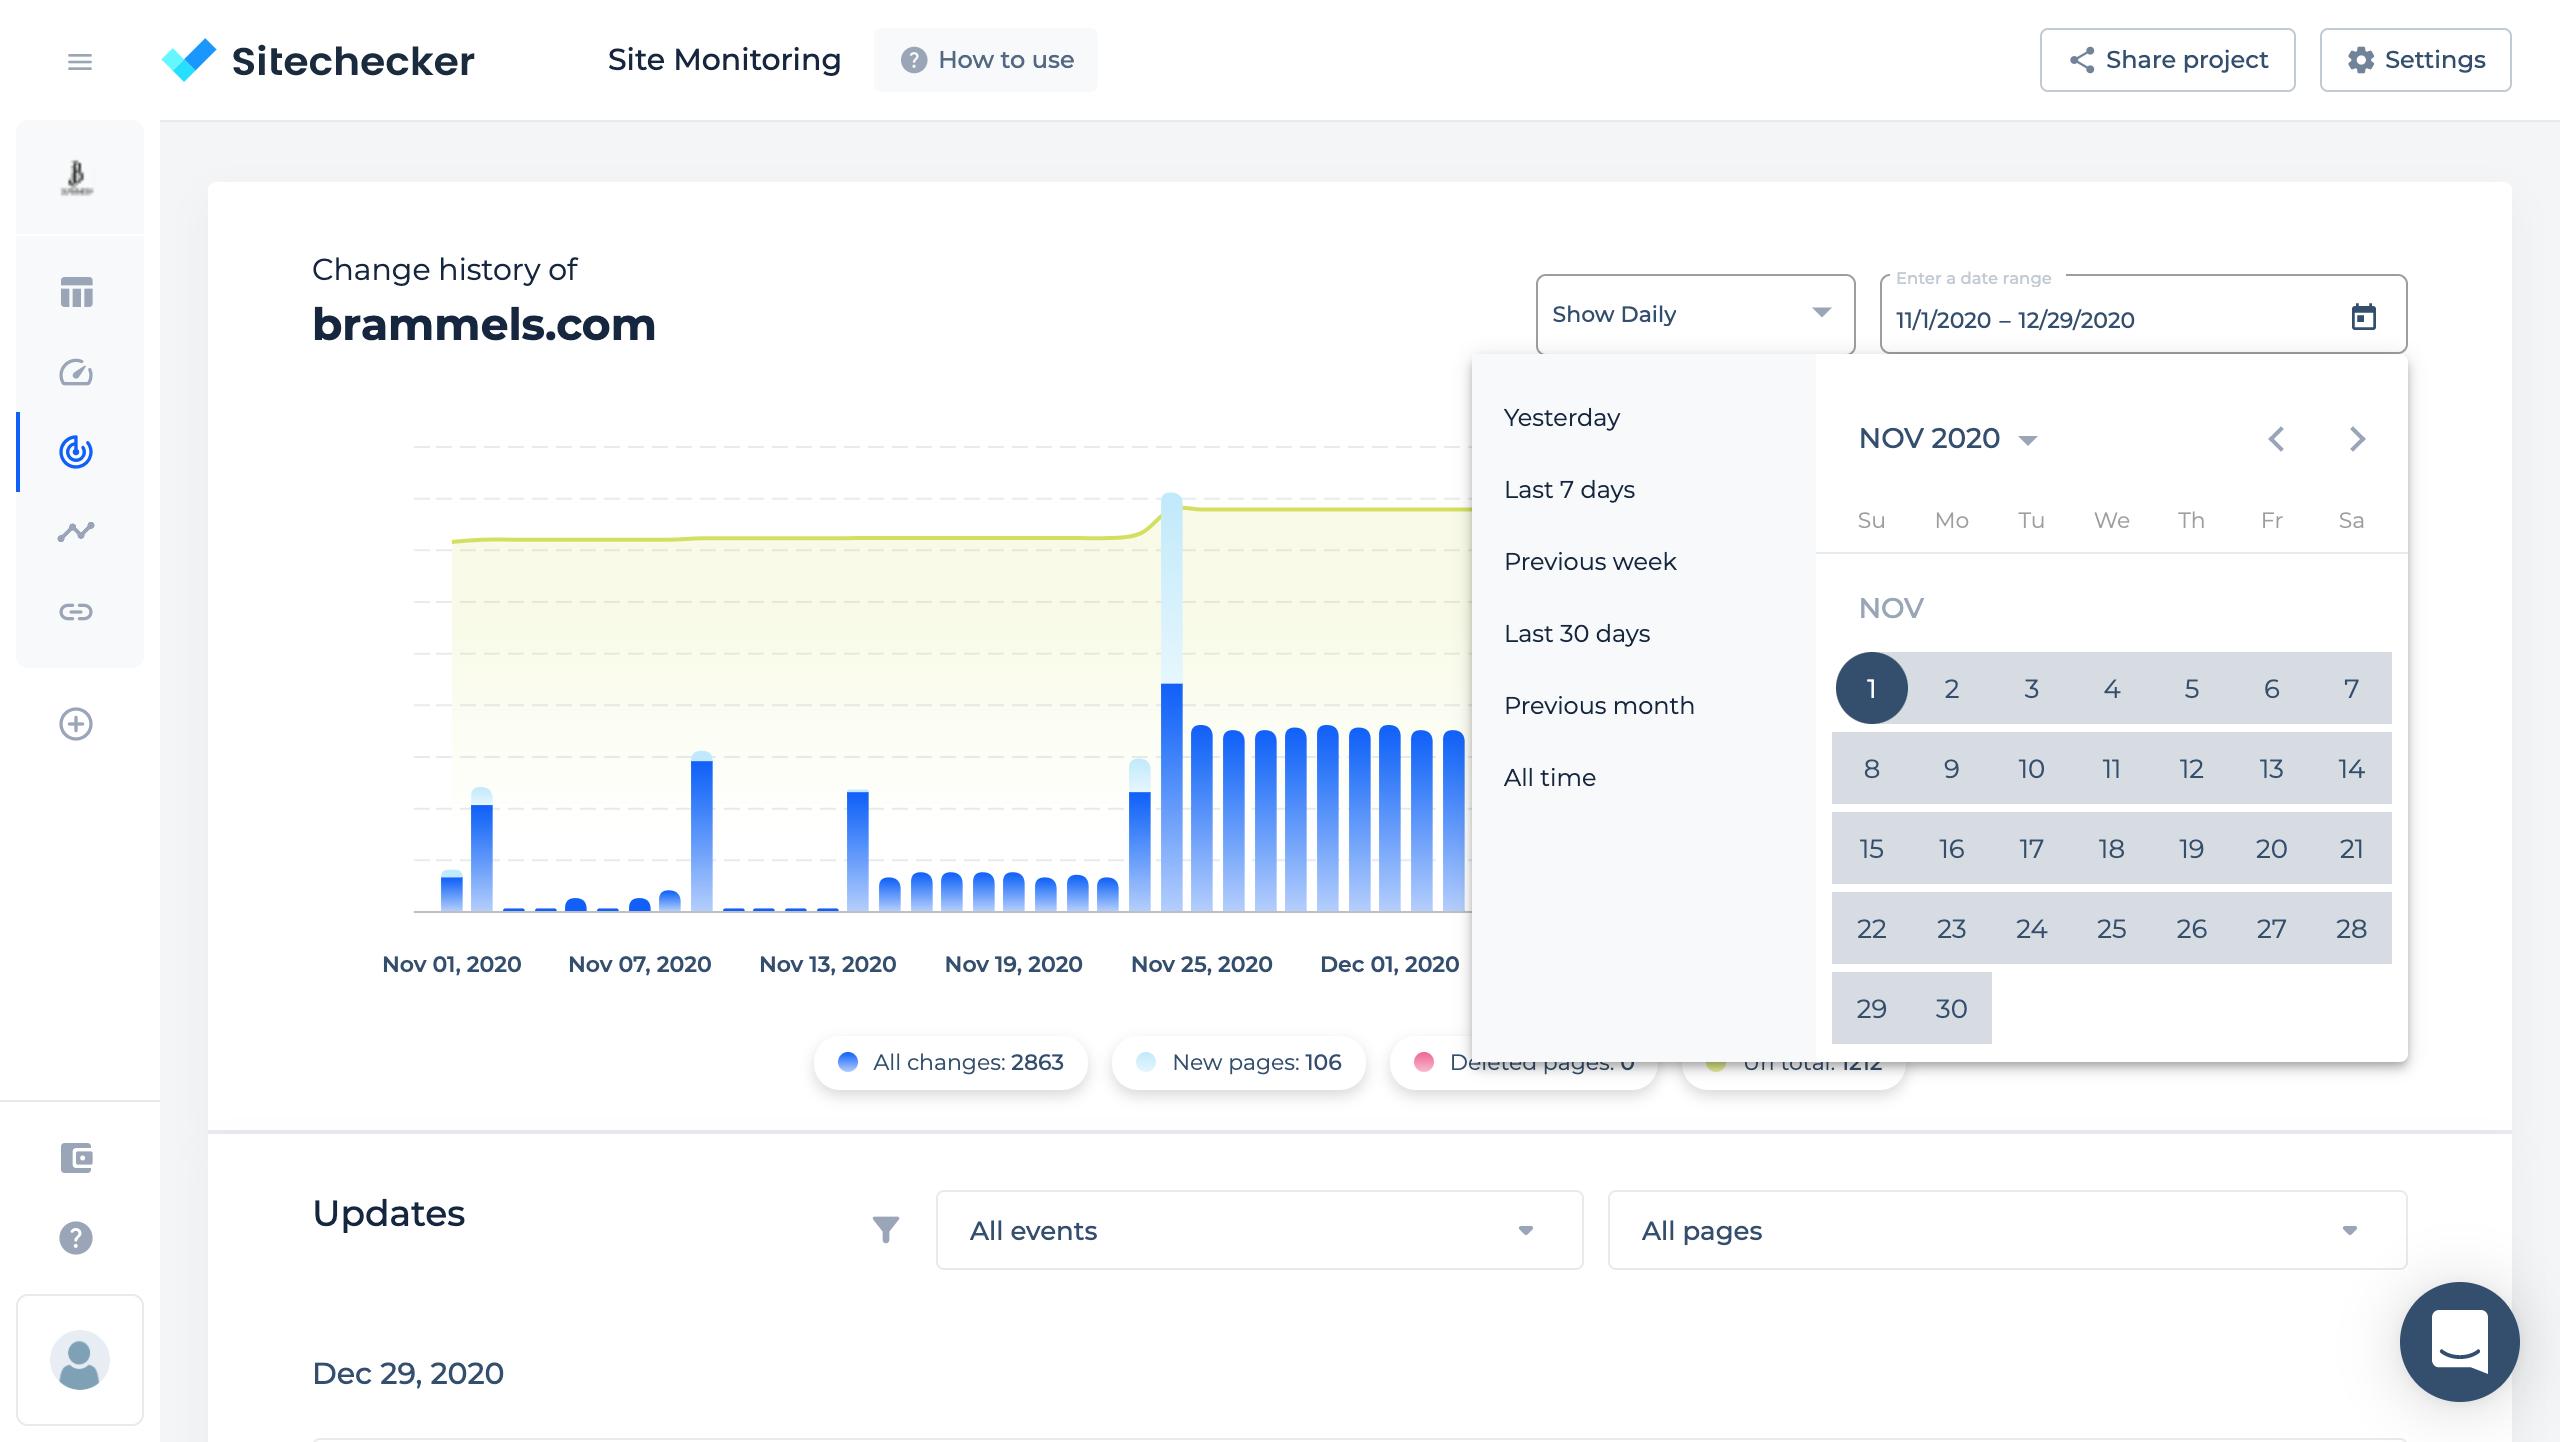 site-monitoring-calendar